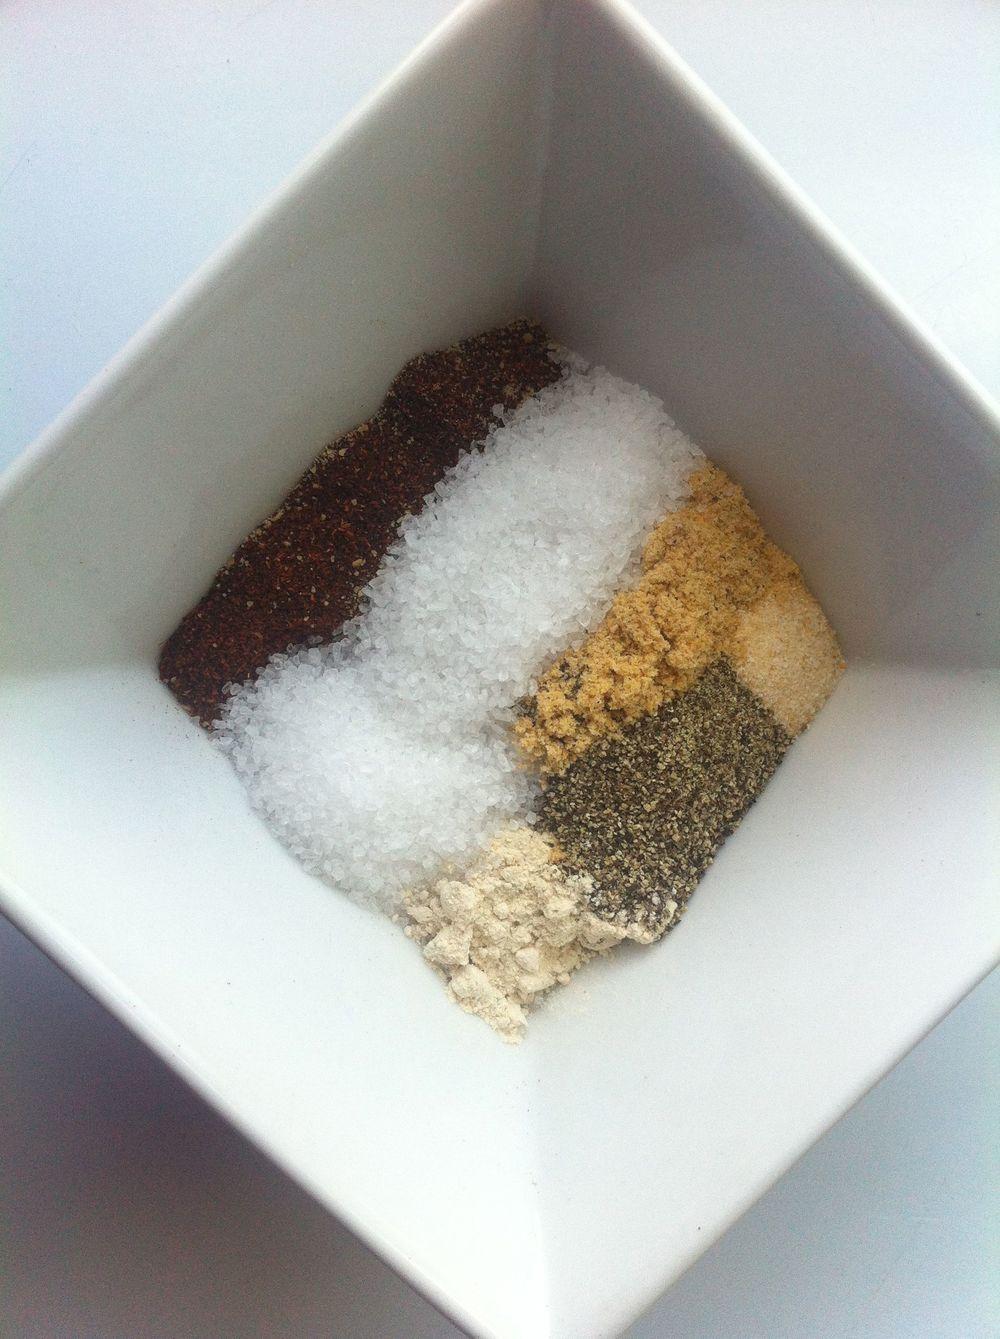 Beef Rub Ingredients: Chili powder, salt, mustard, onion powder, pepper, and garlic powder